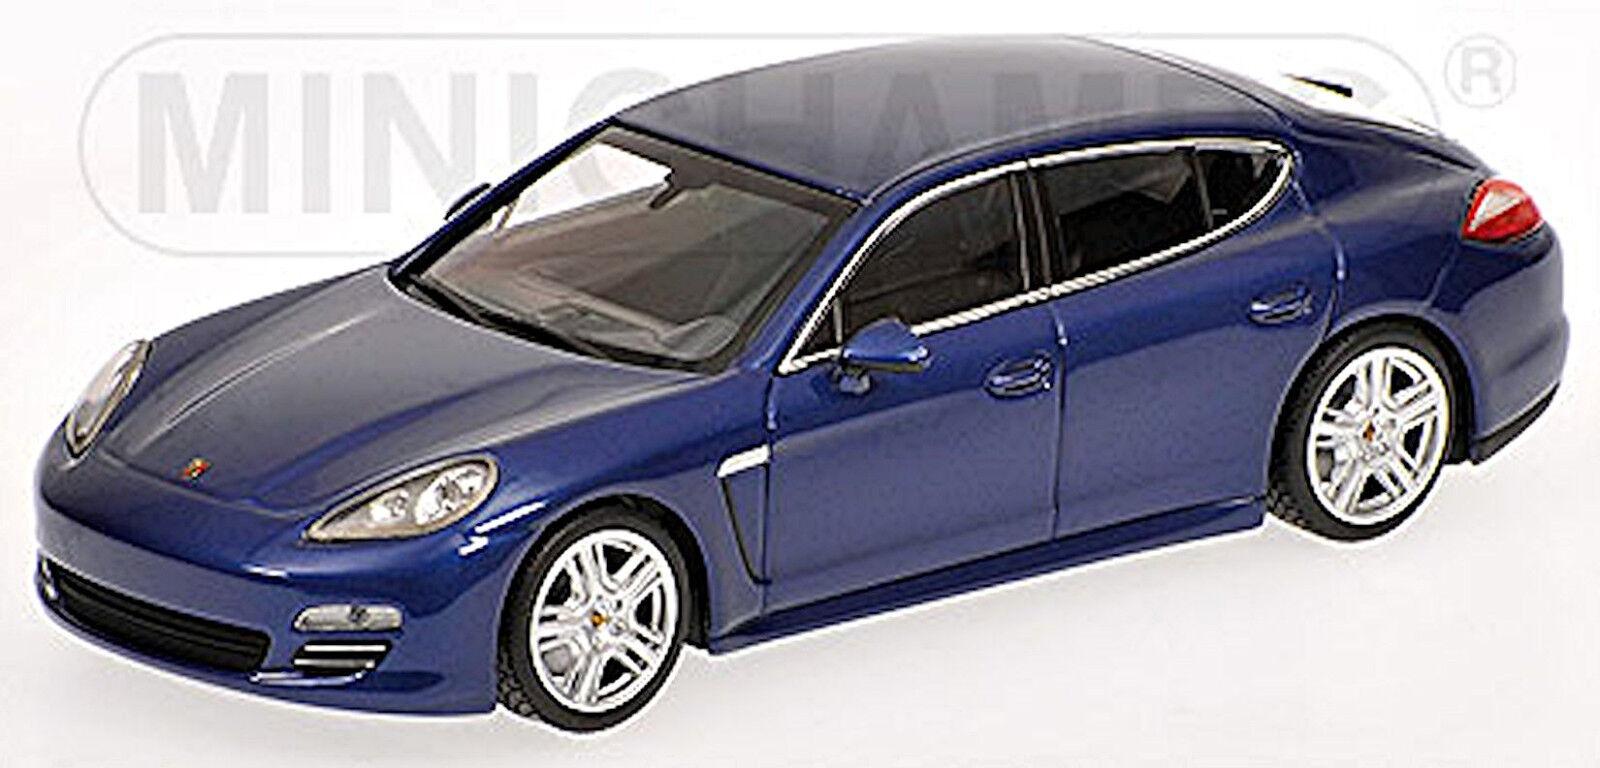 Porsche Panamera 4 Limousine 2009-13 Typ 970 bluee Aquablue metallic 1 43